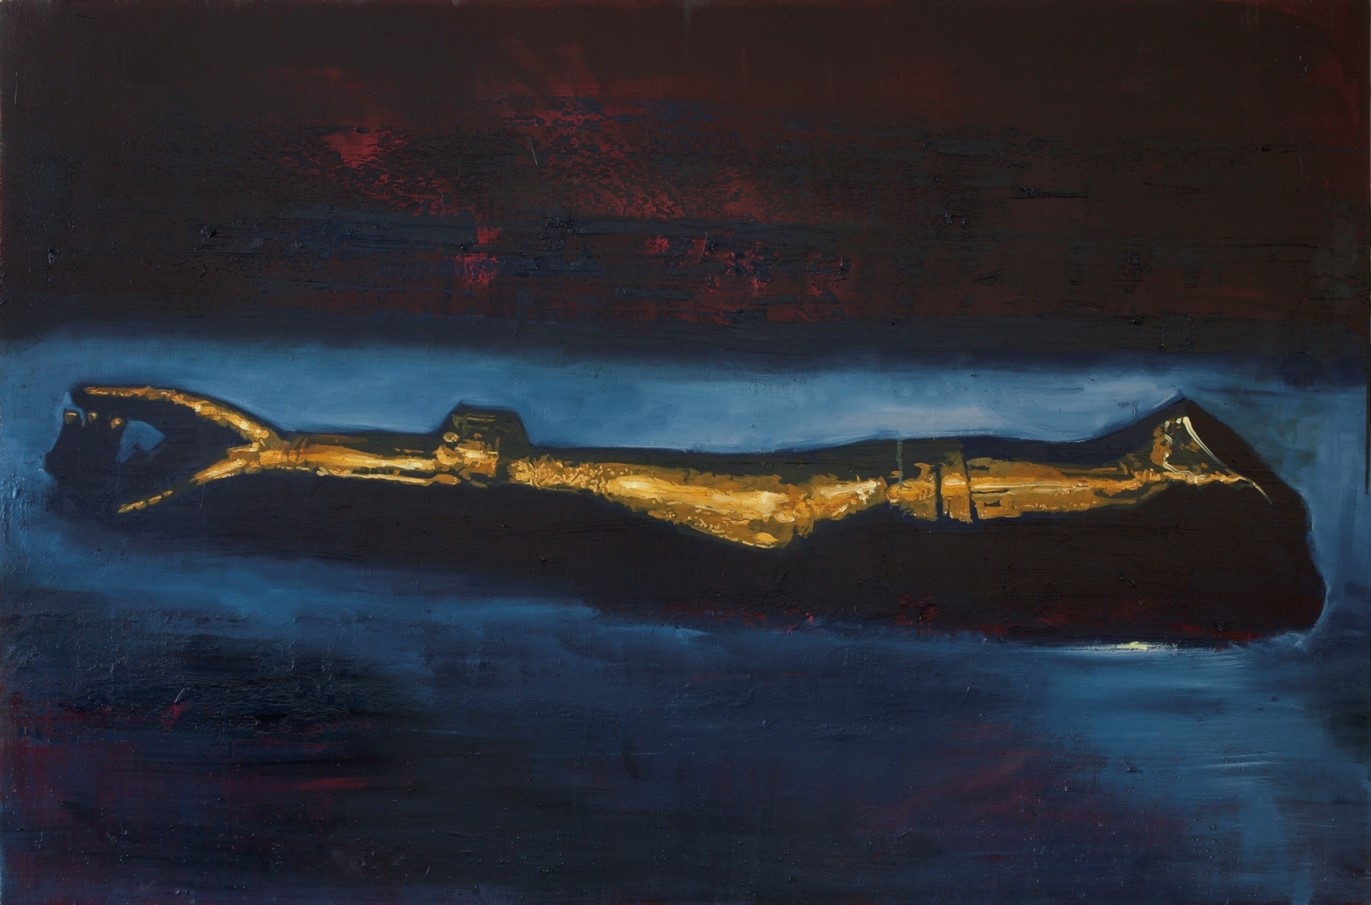 Oren Eliav, Arm, 2011, Oil on canvas, 100 x 150 cm